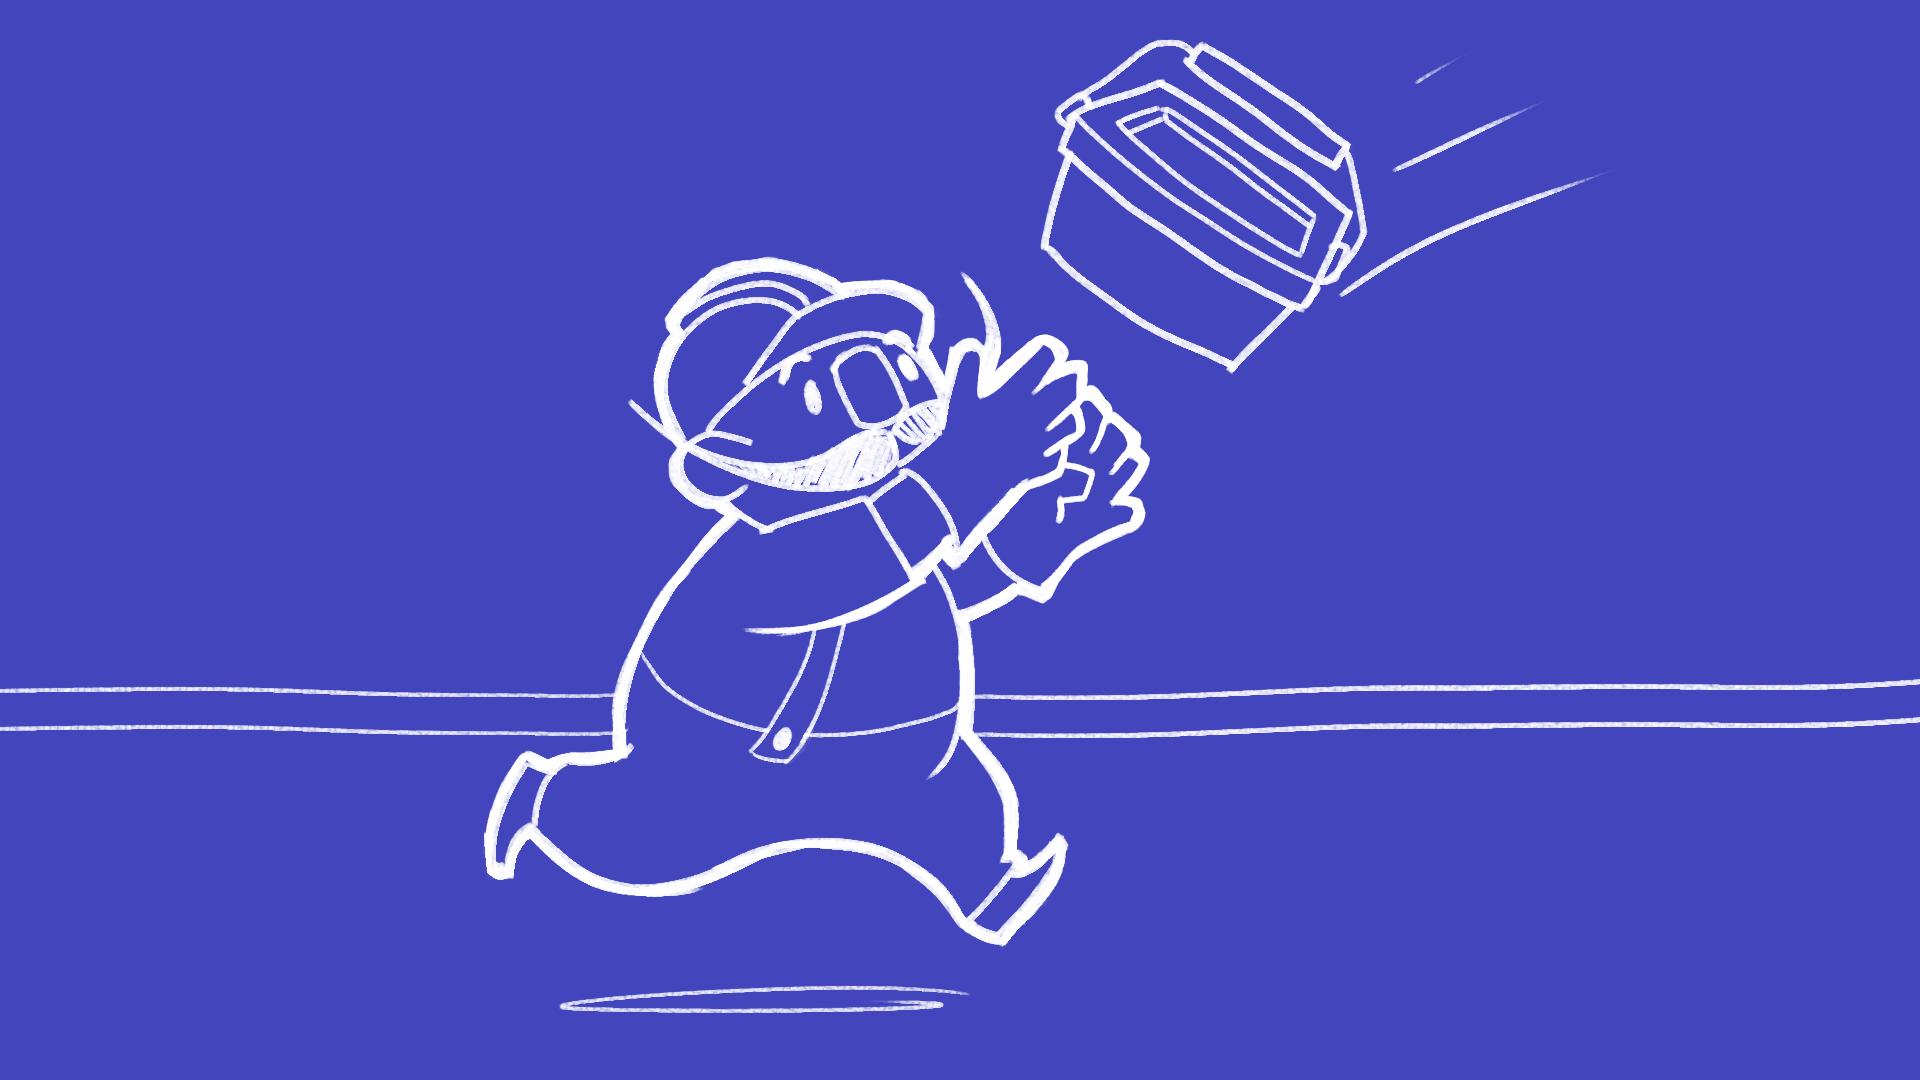 Icon for Catcher